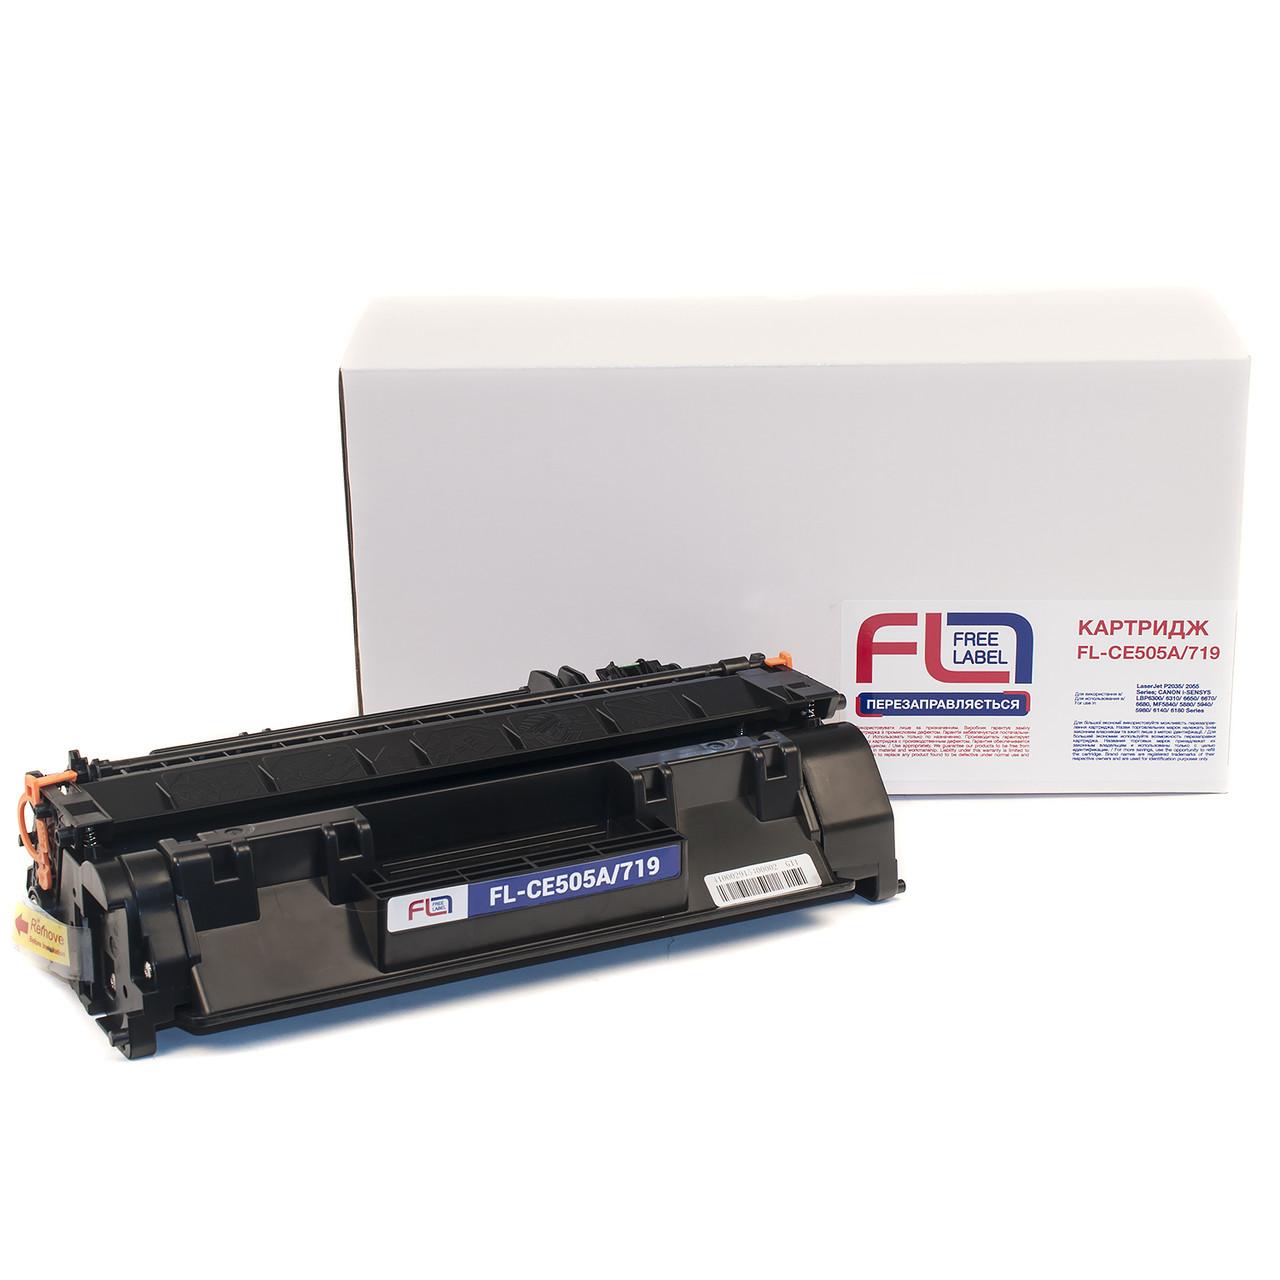 Лазерний Картридж HP LJ CE505A/CANON 719 (FL-CE505A/719) INCOLOR Canon i-SENSYS MF3010B